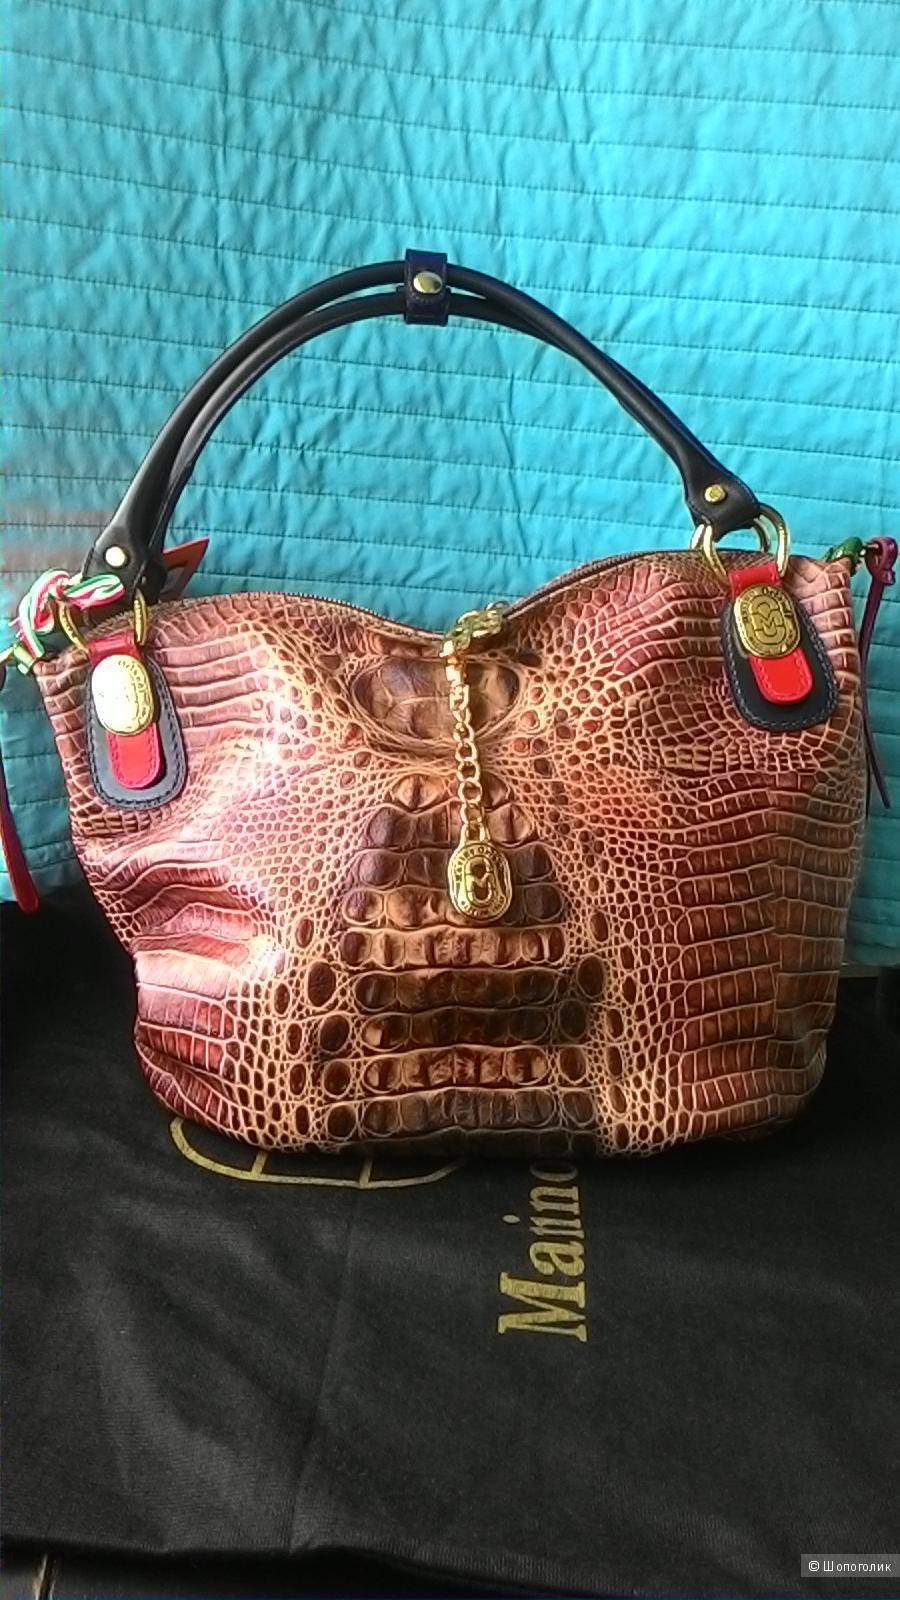 DJ Кейсы, сумки, чехлы : SKB 84DJ - mmagru